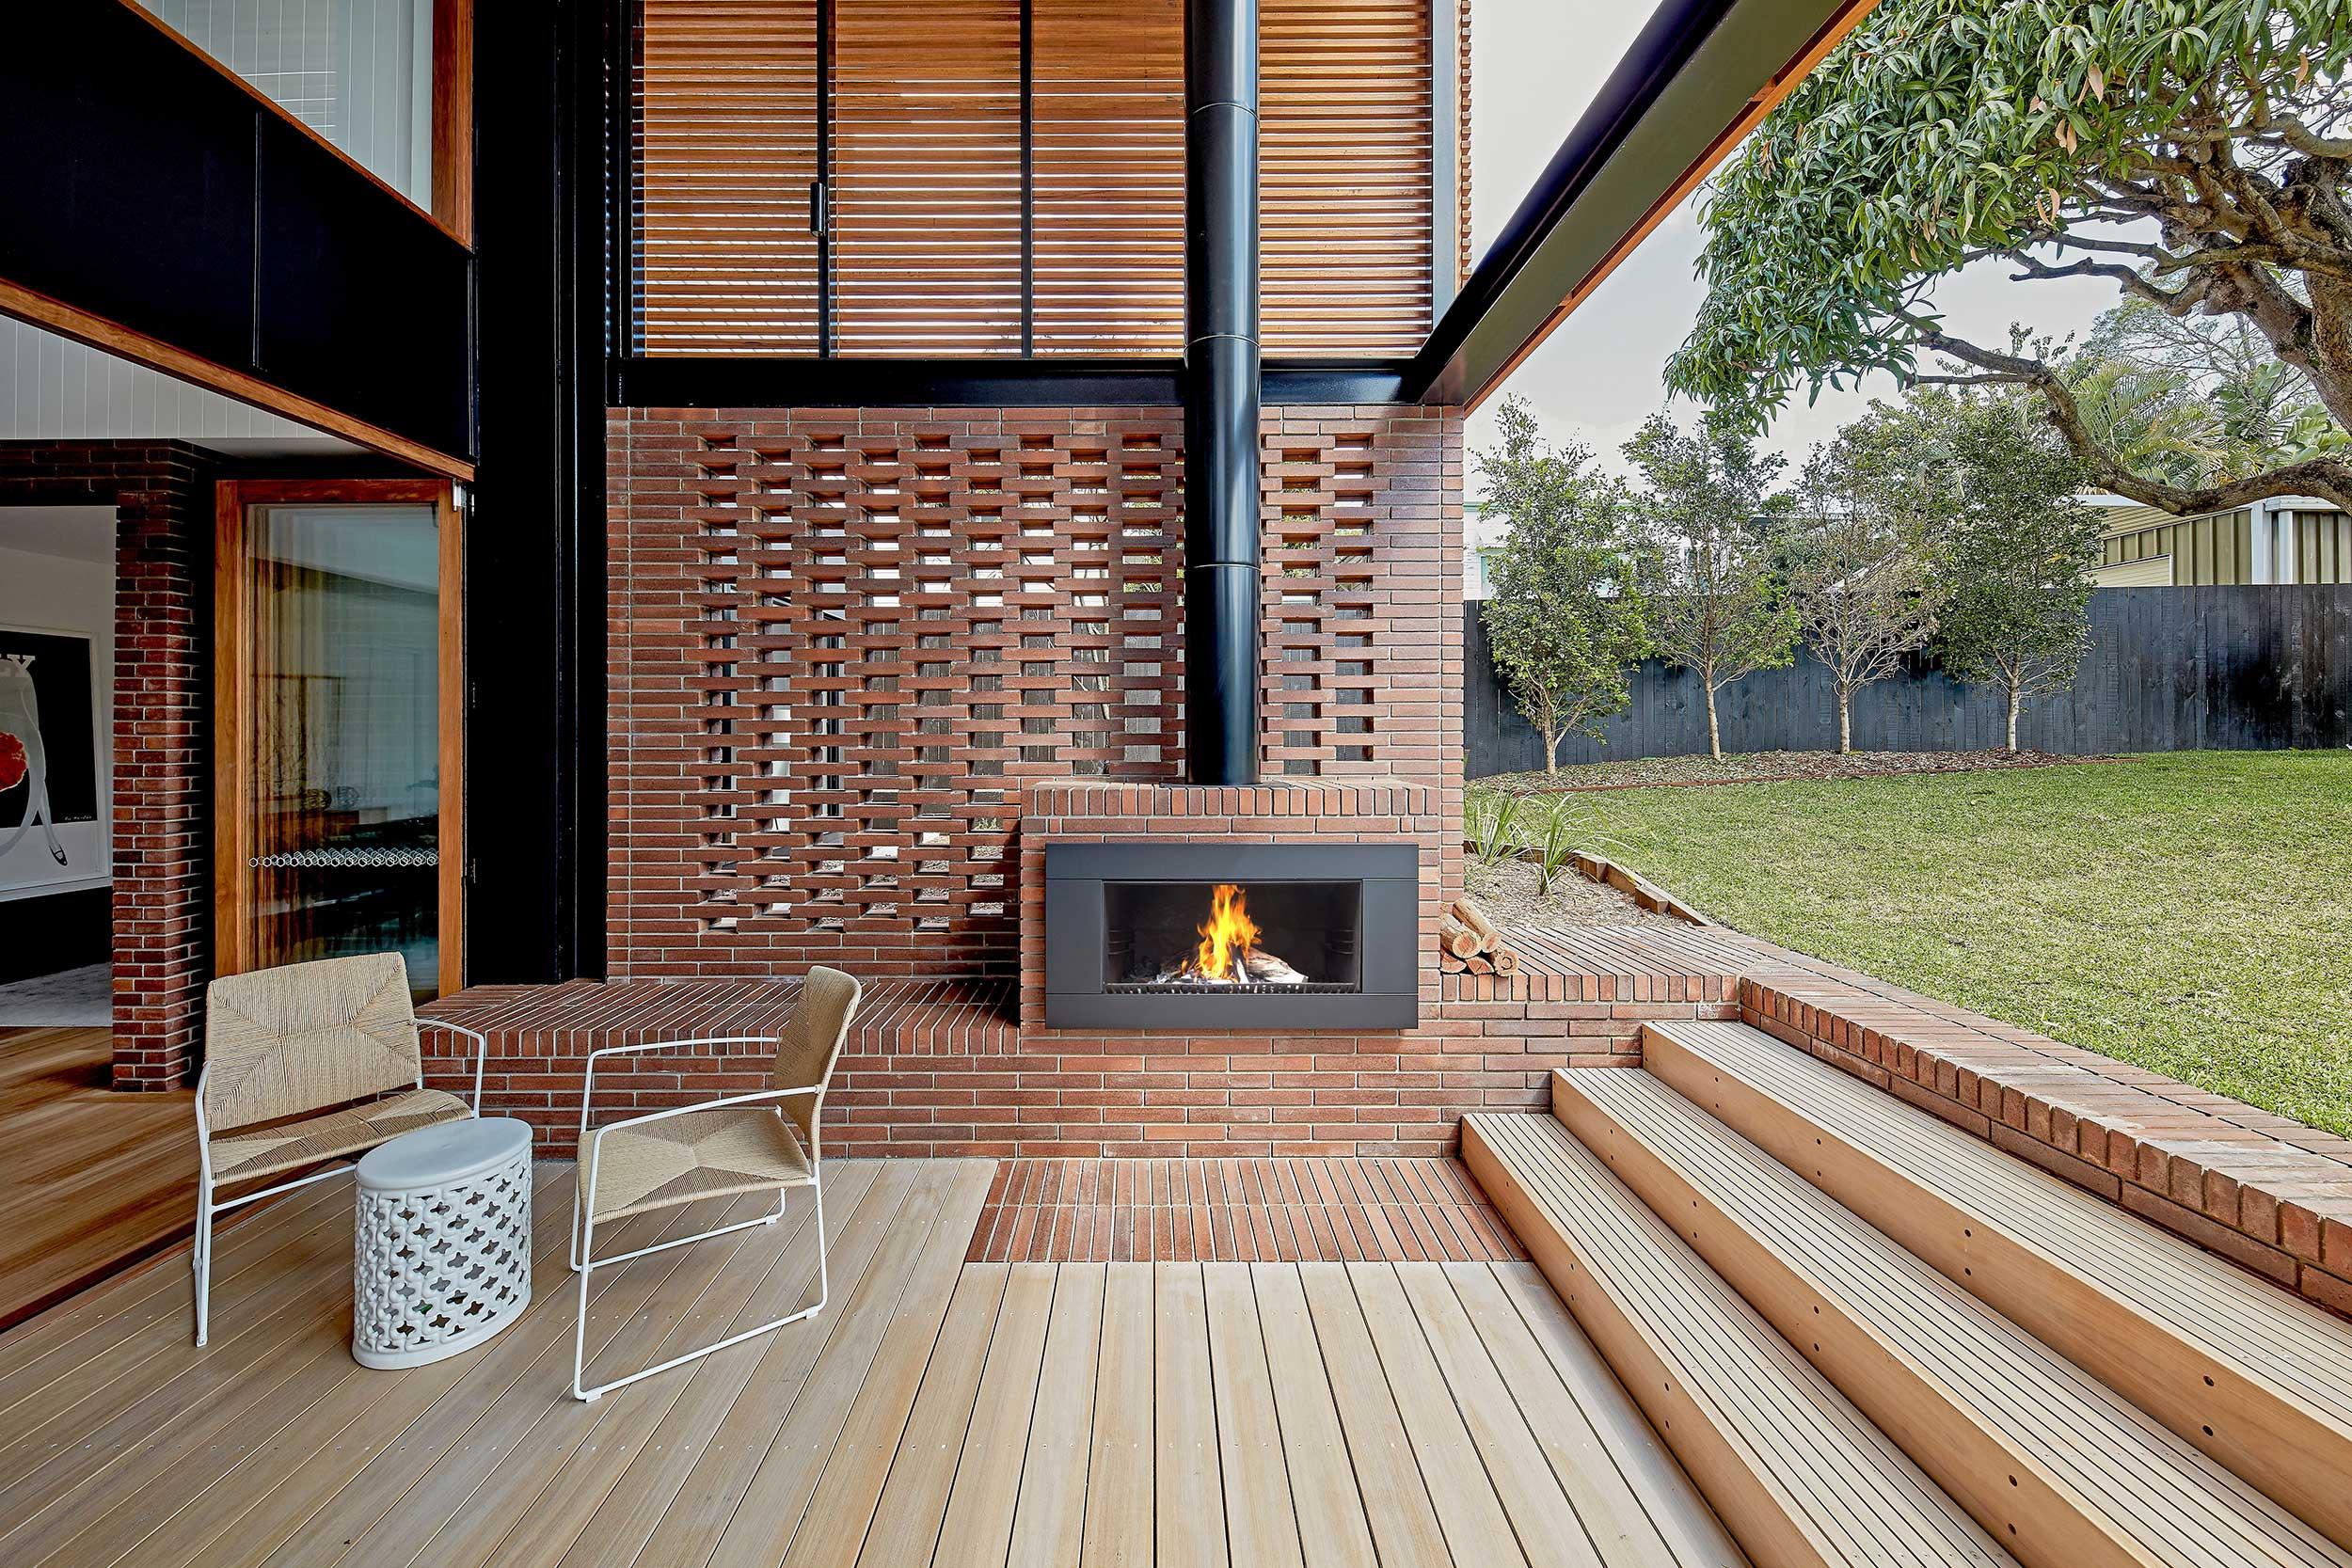 Entertain Al Fresco – 10 outdoor wood fire designs to inspire your own backyard.